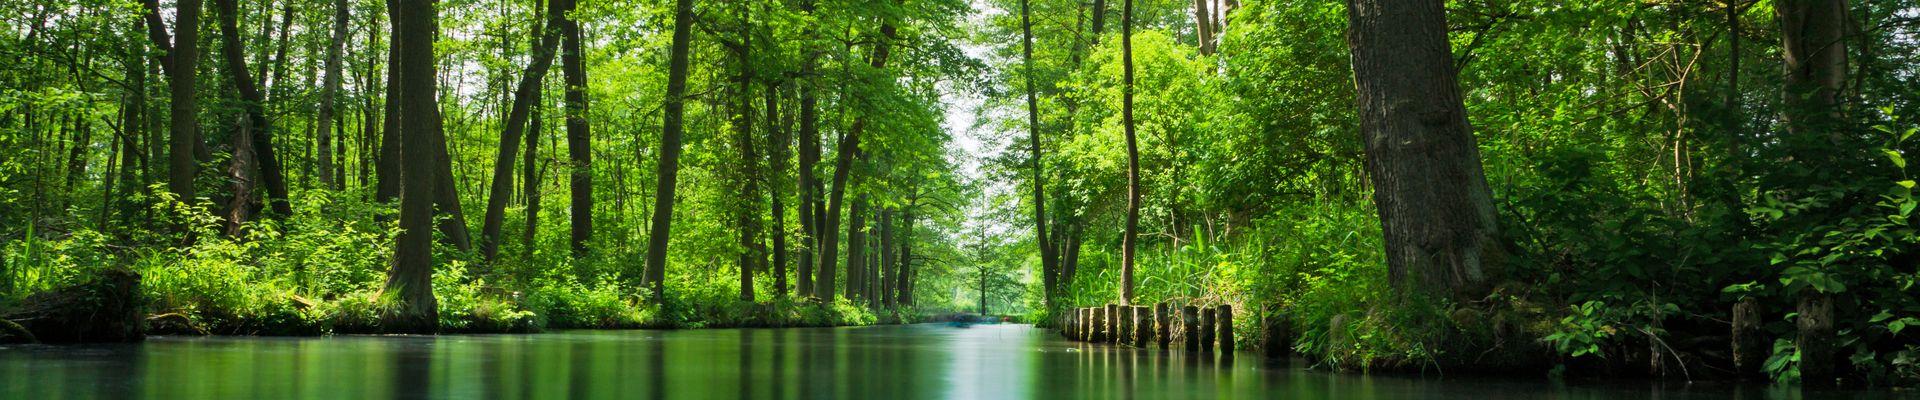 Wellness Wochenende im Spreewald